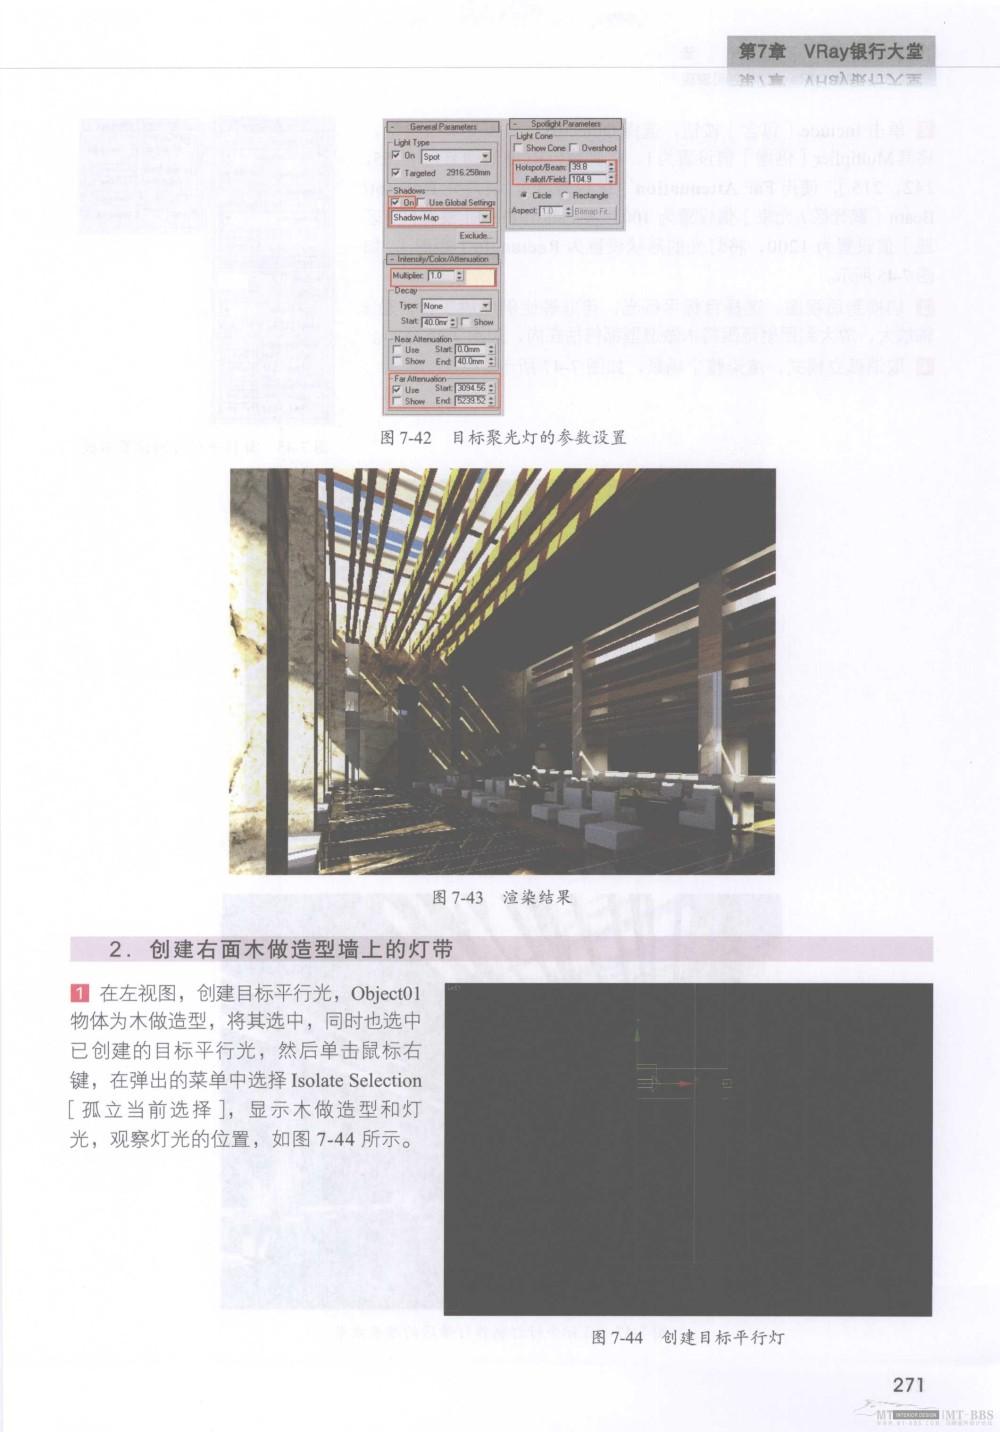 水晶石技法-3ds_Max&VRay室内空间表现_水晶石技法-3ds_Max&VRay室内空间表现_页面_277.jpg